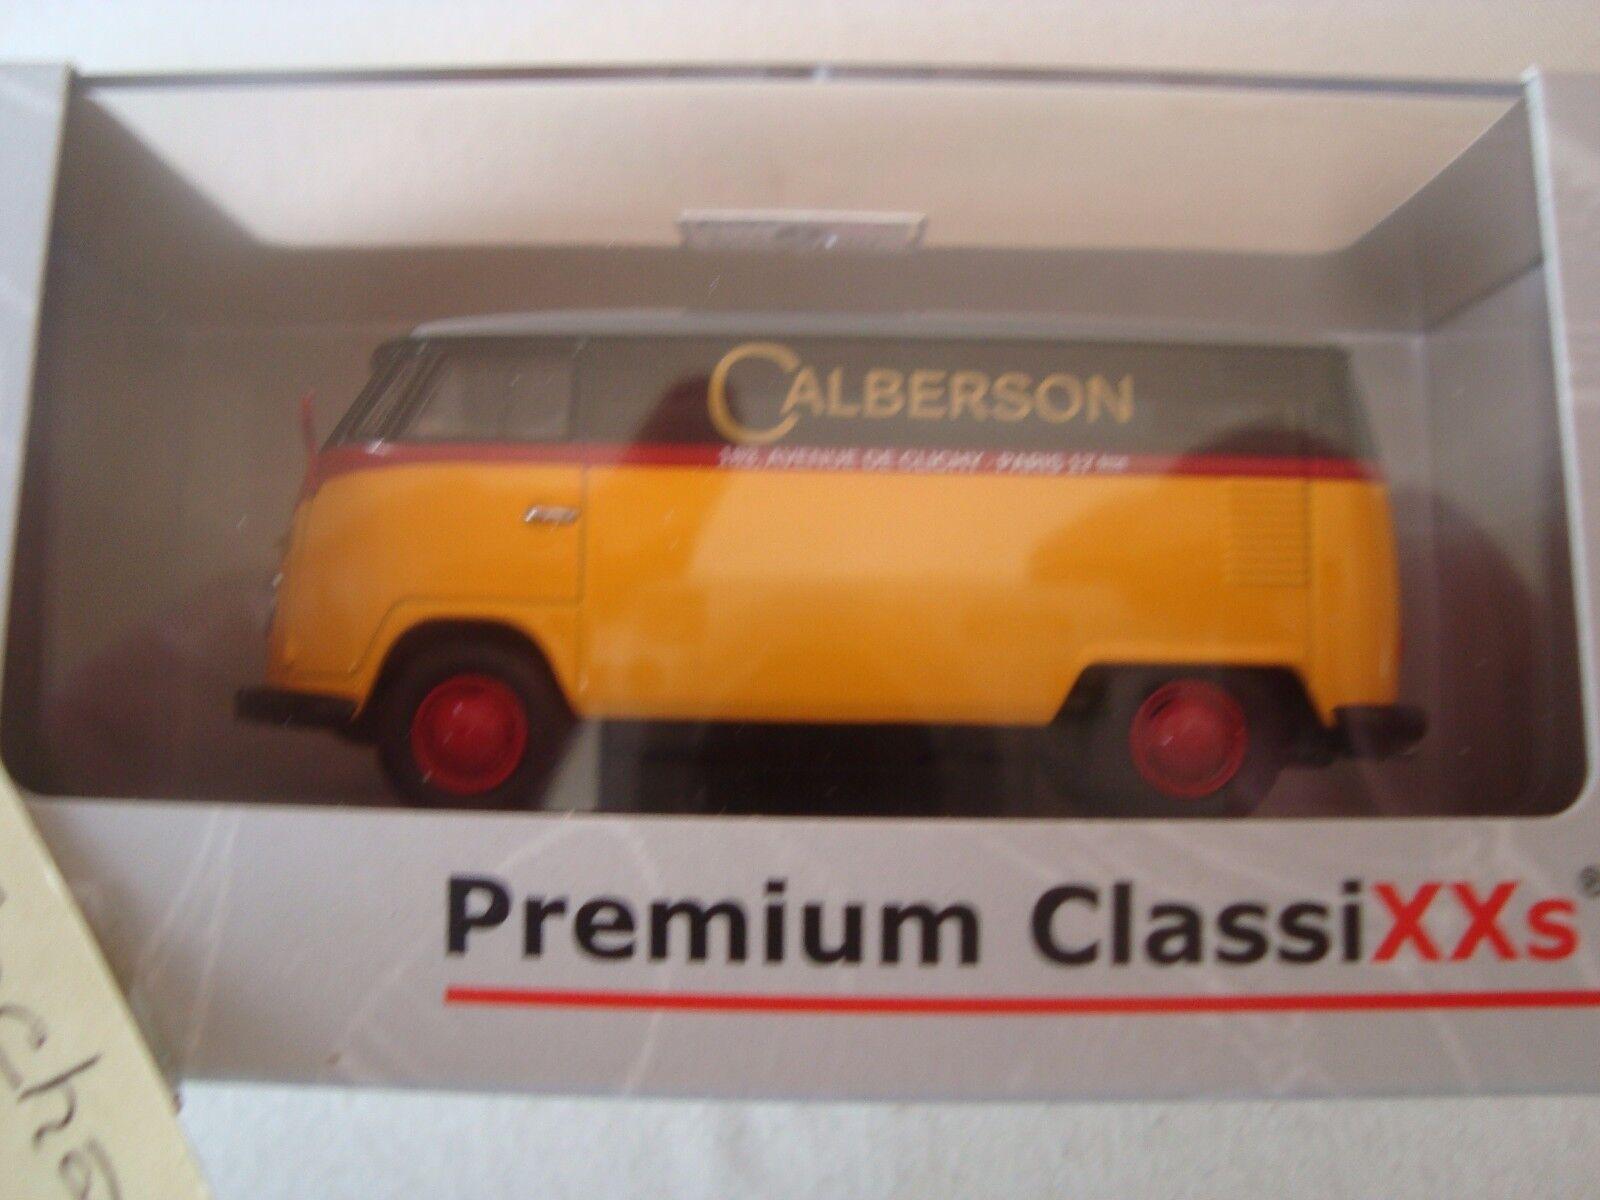 VW TRANSPORTER T1 CALBERSON PARIS PREMIUM CLASSIXXS VAN   WAGON SHEET NO. 13803